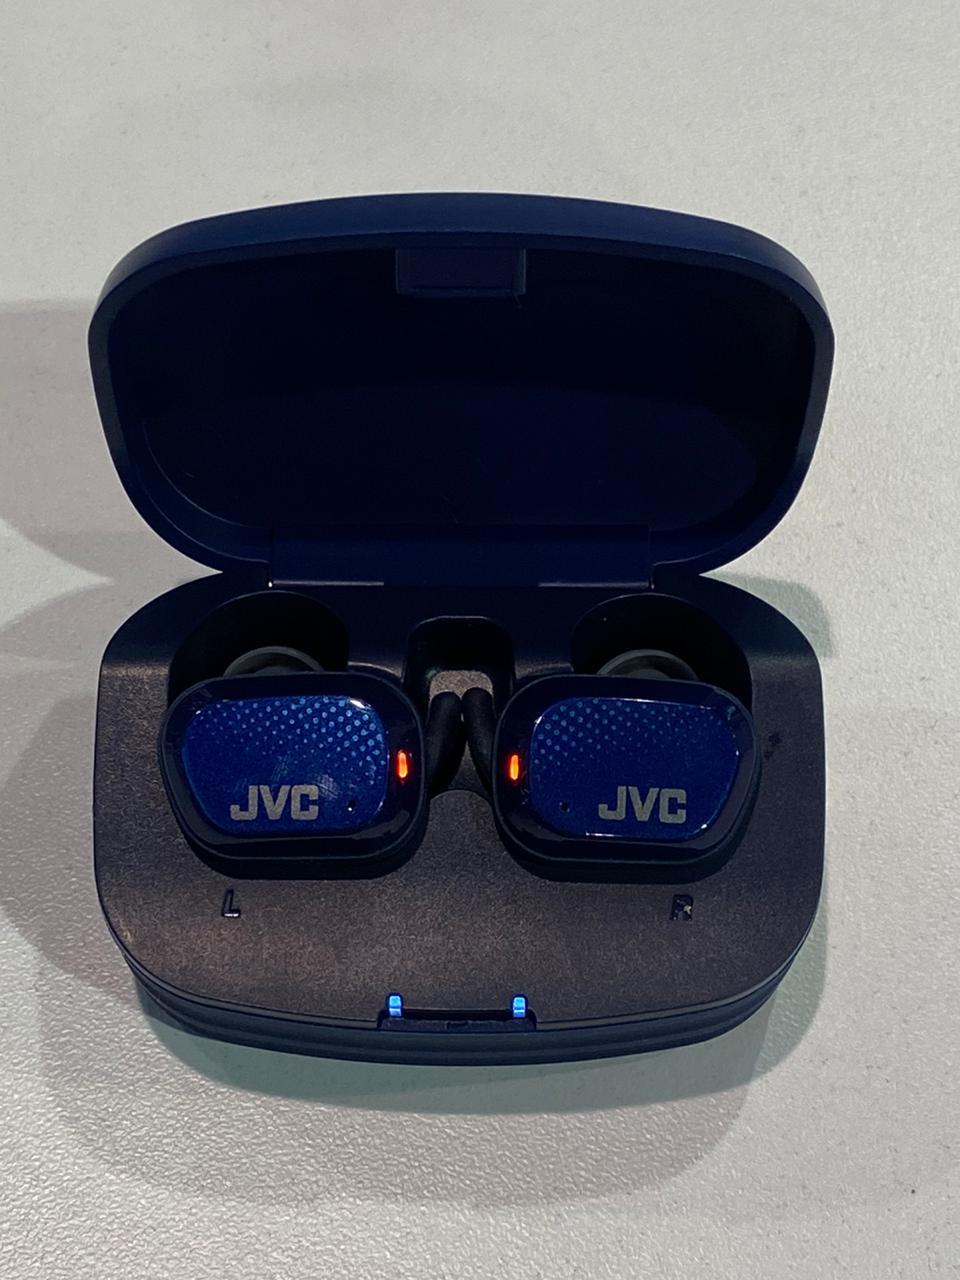 Fones de ouvido JVC